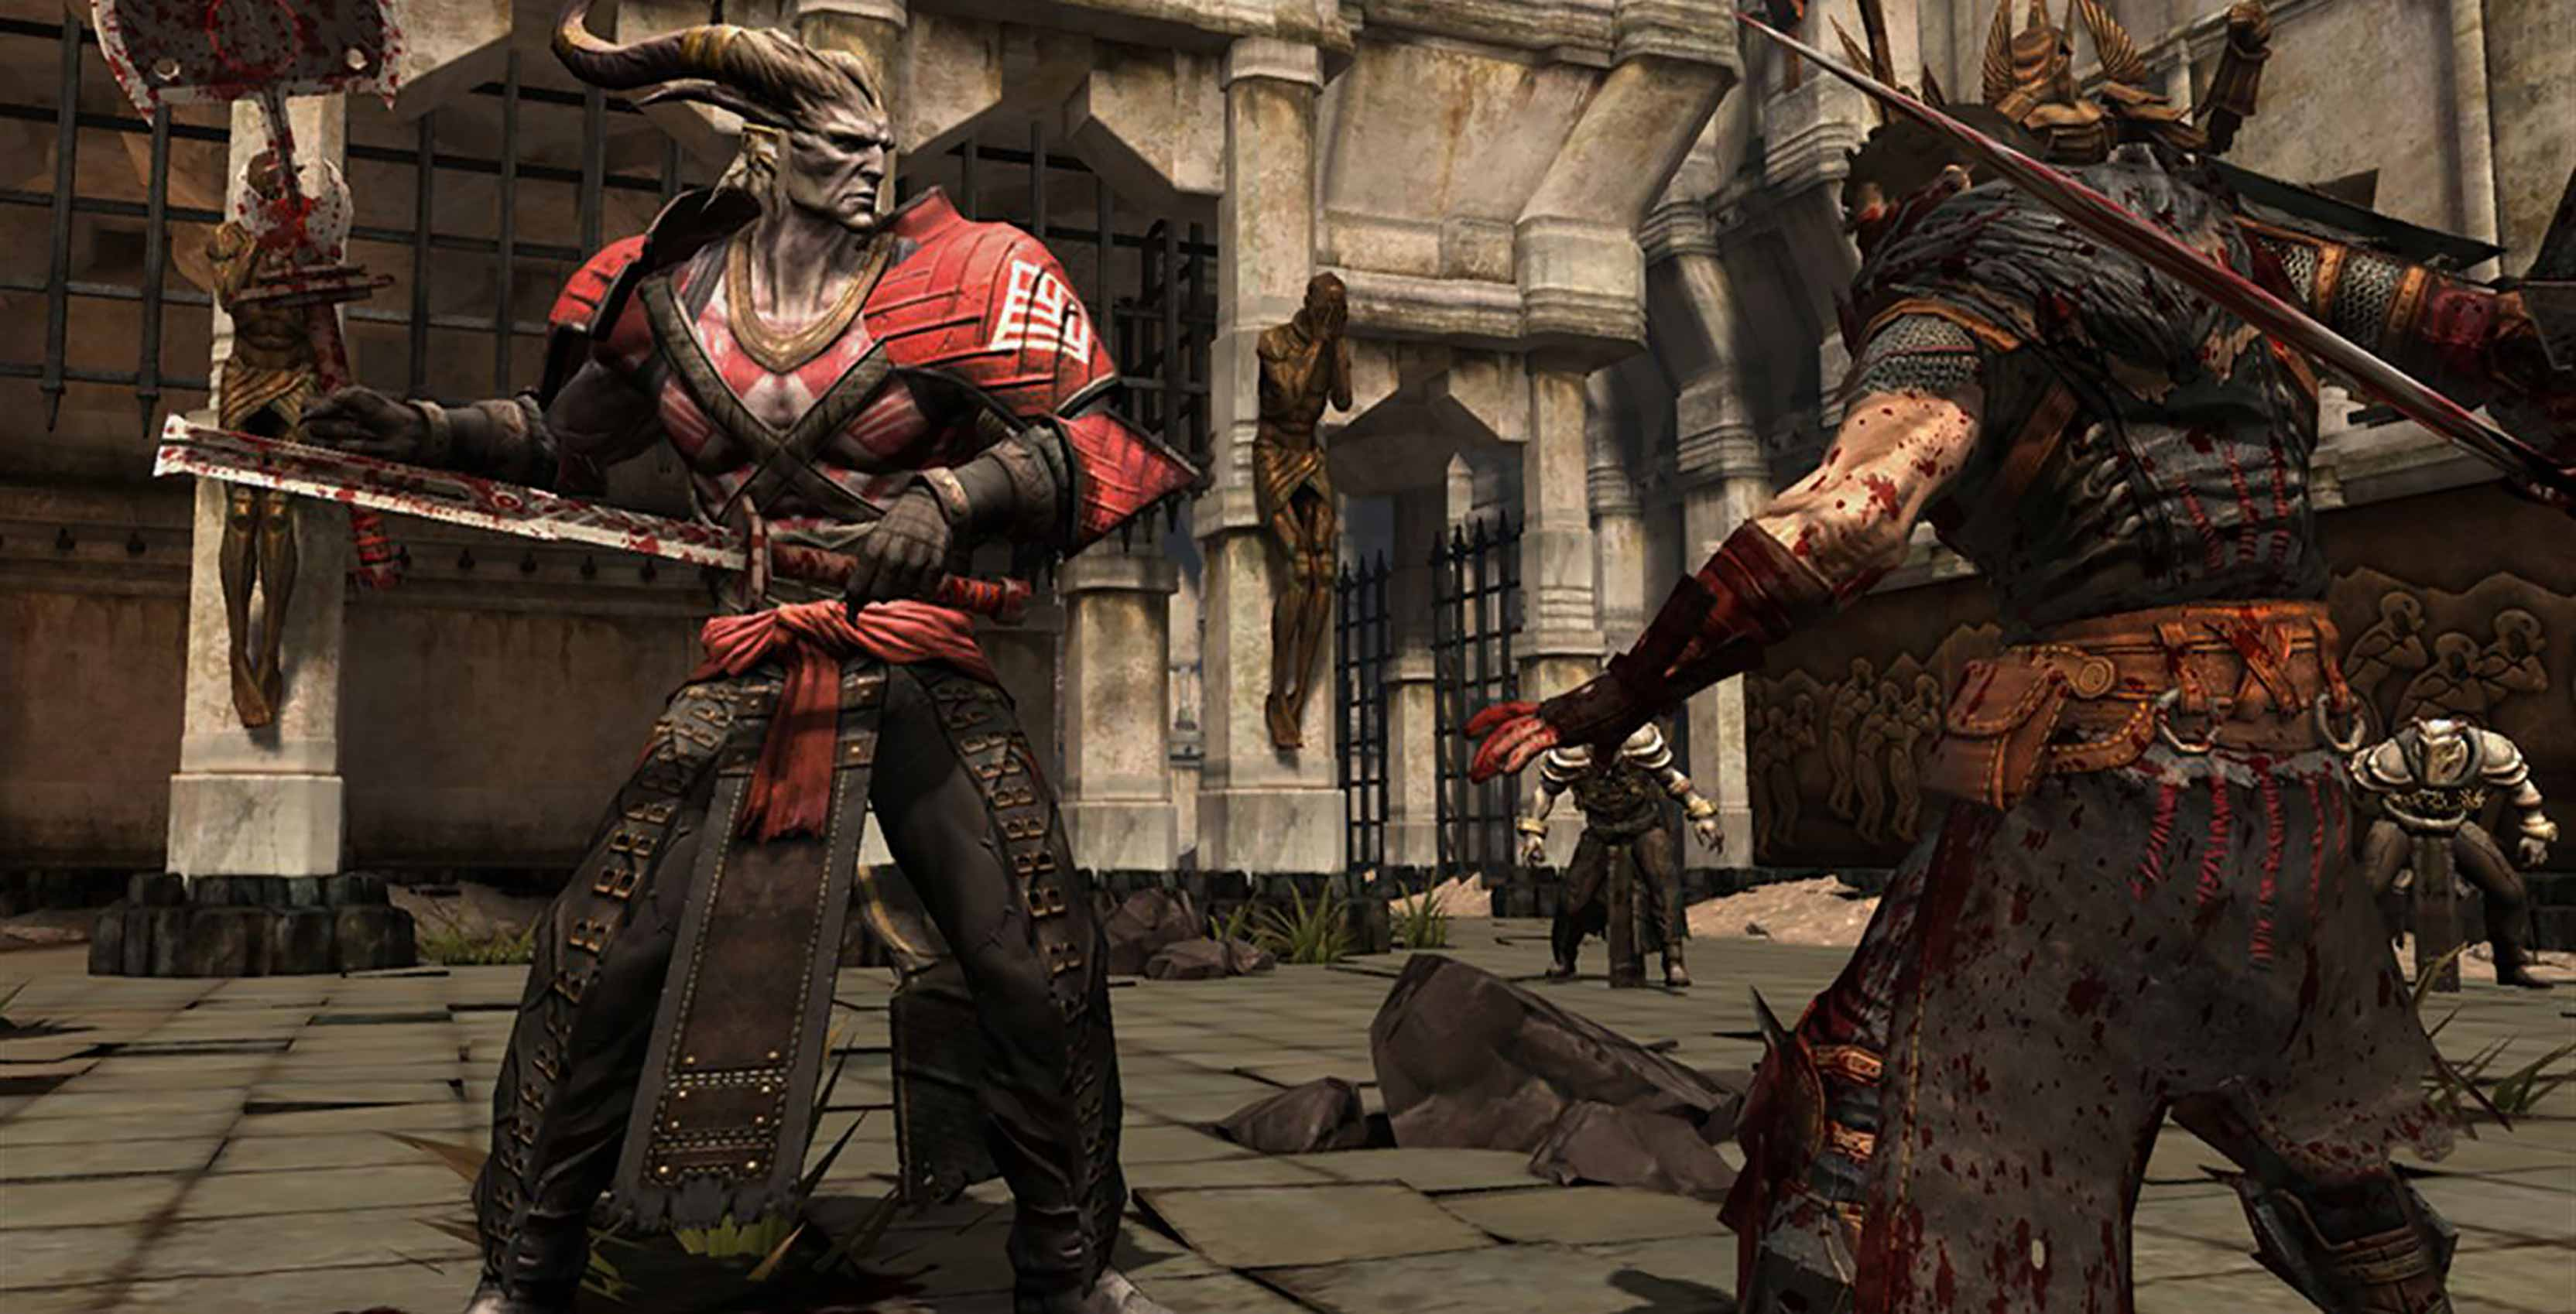 Dragon Age 2 combat